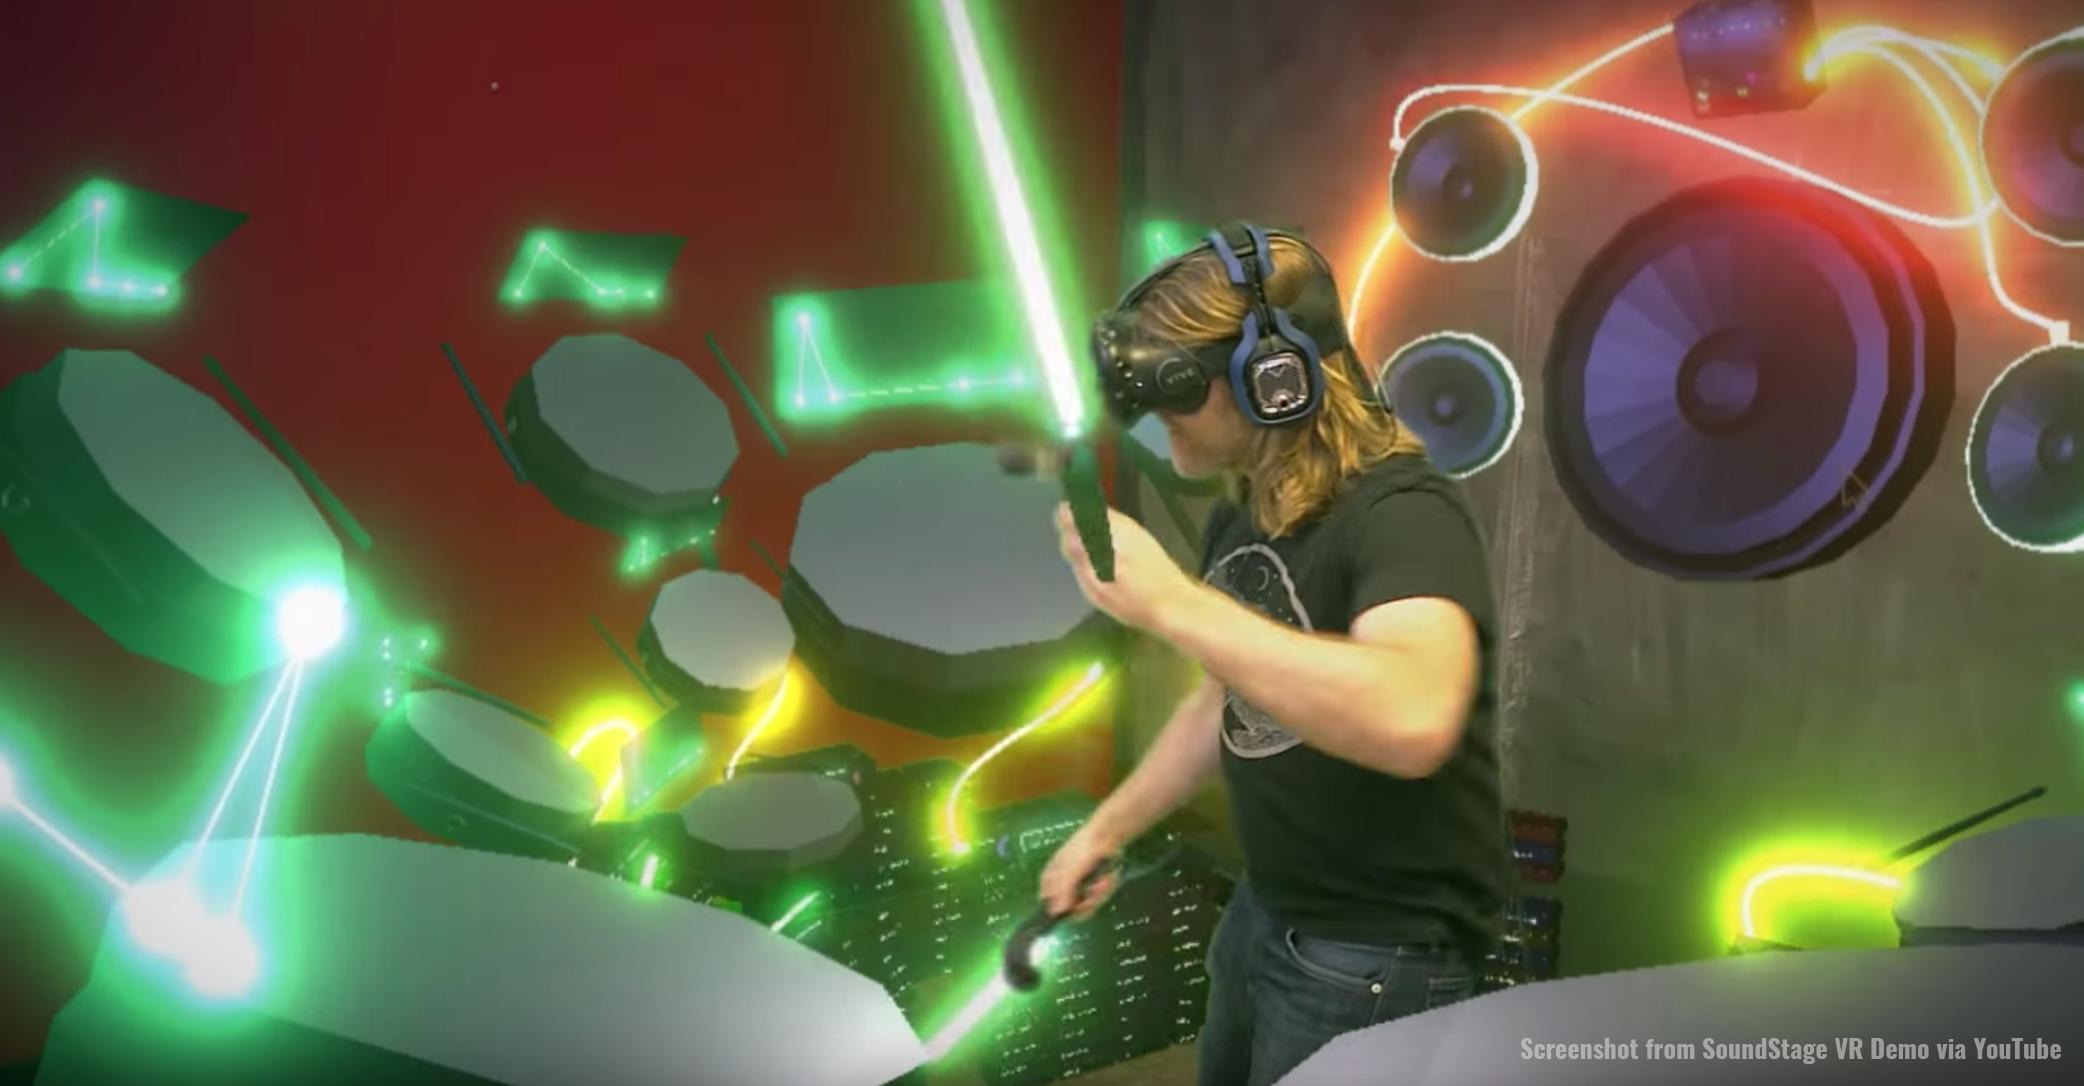 VR Music Demo